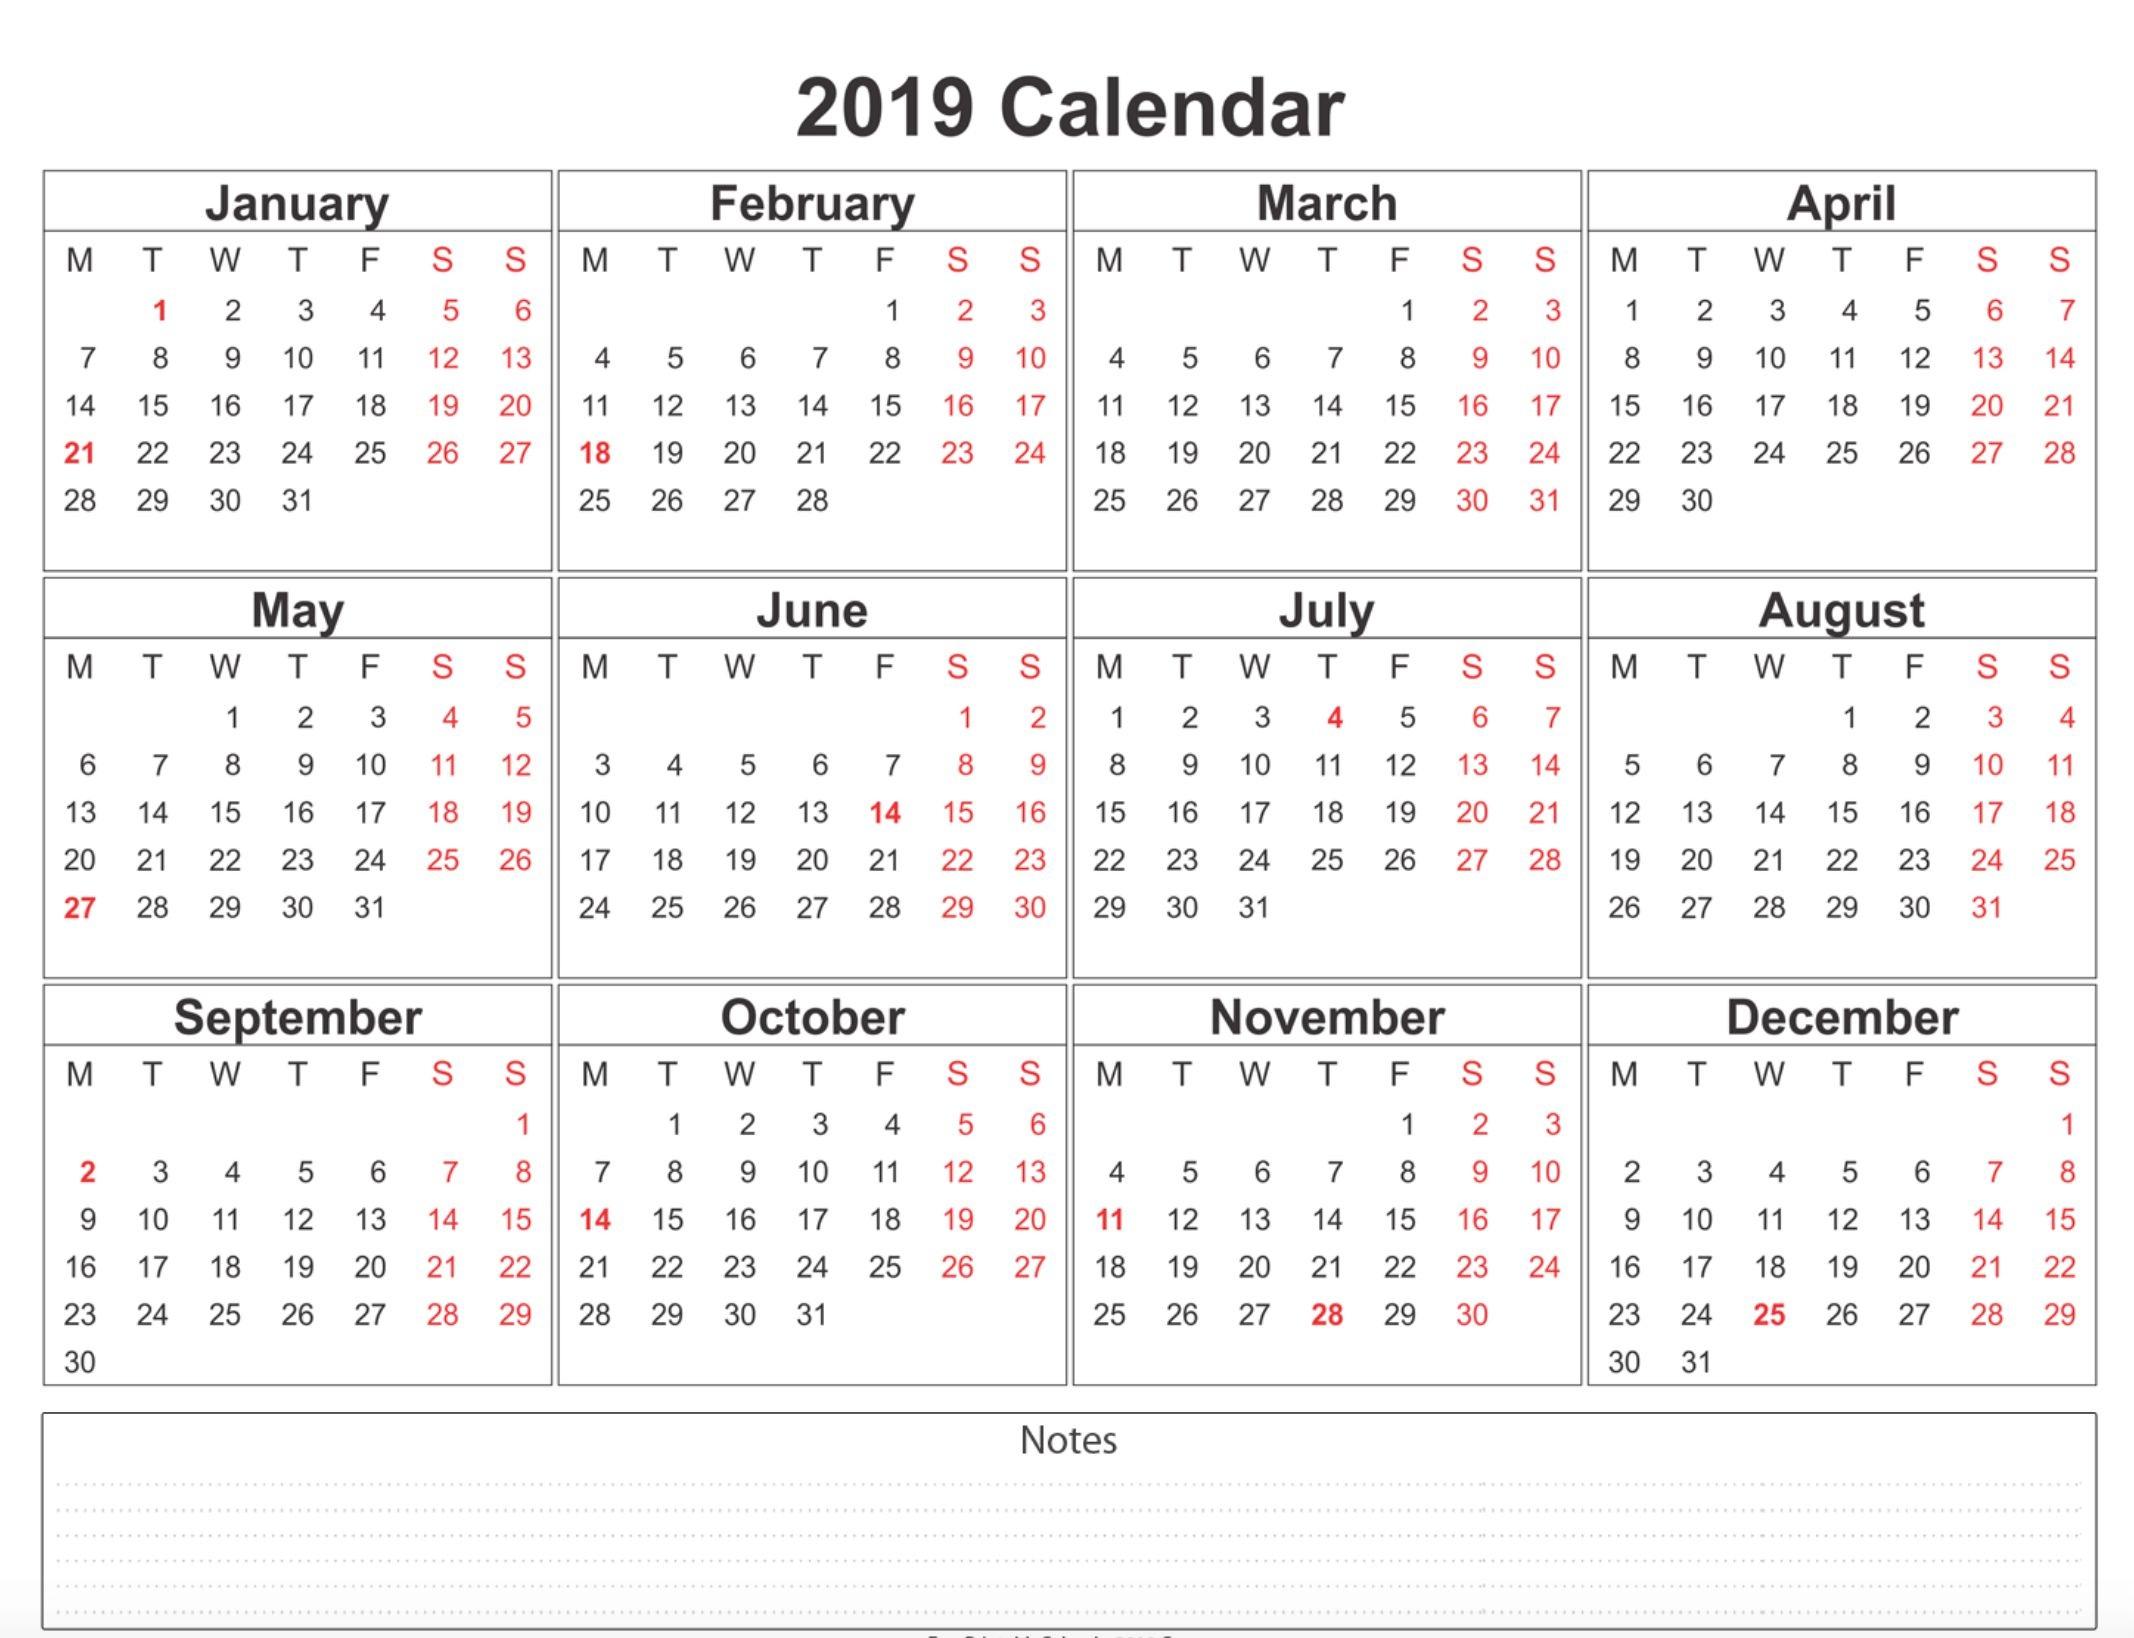 2019 Calendar Printable Free A4 Template